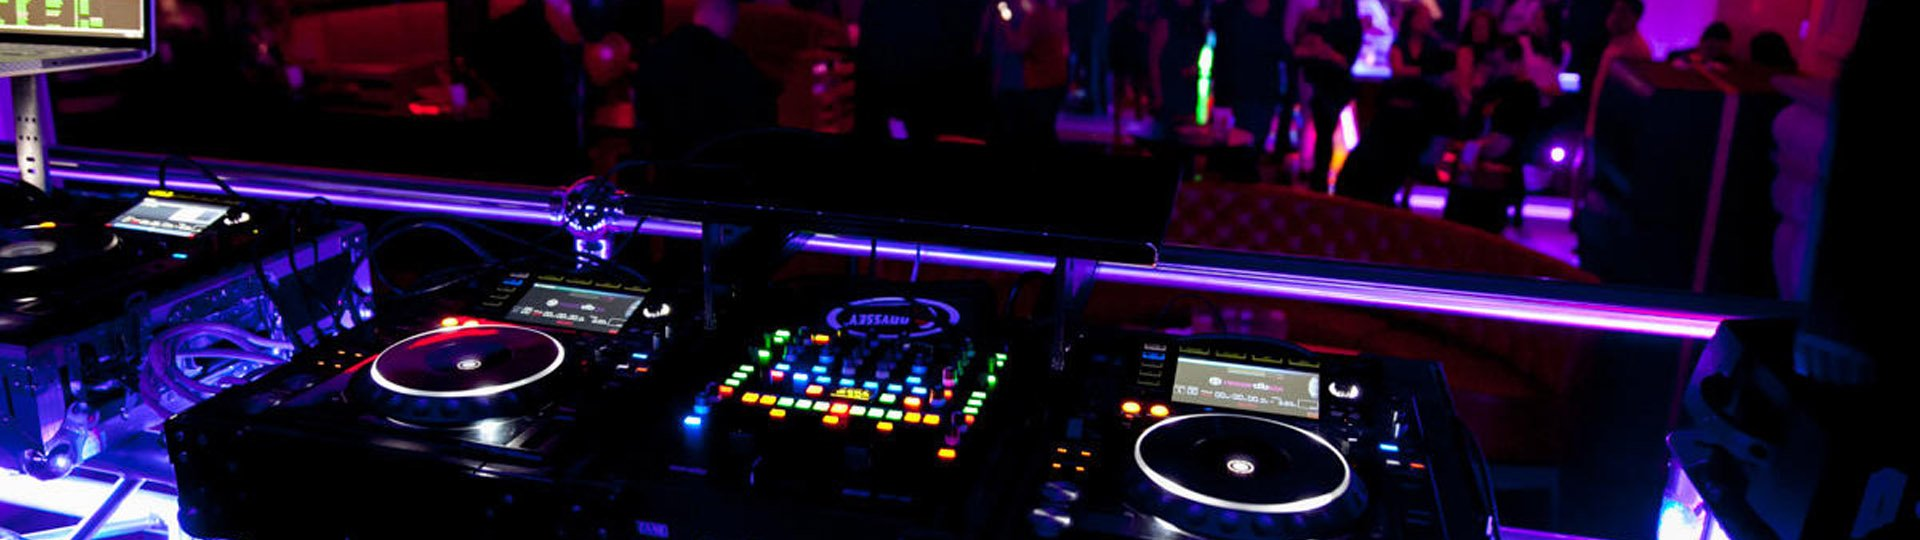 Бар ночной клуб «Havana Club»